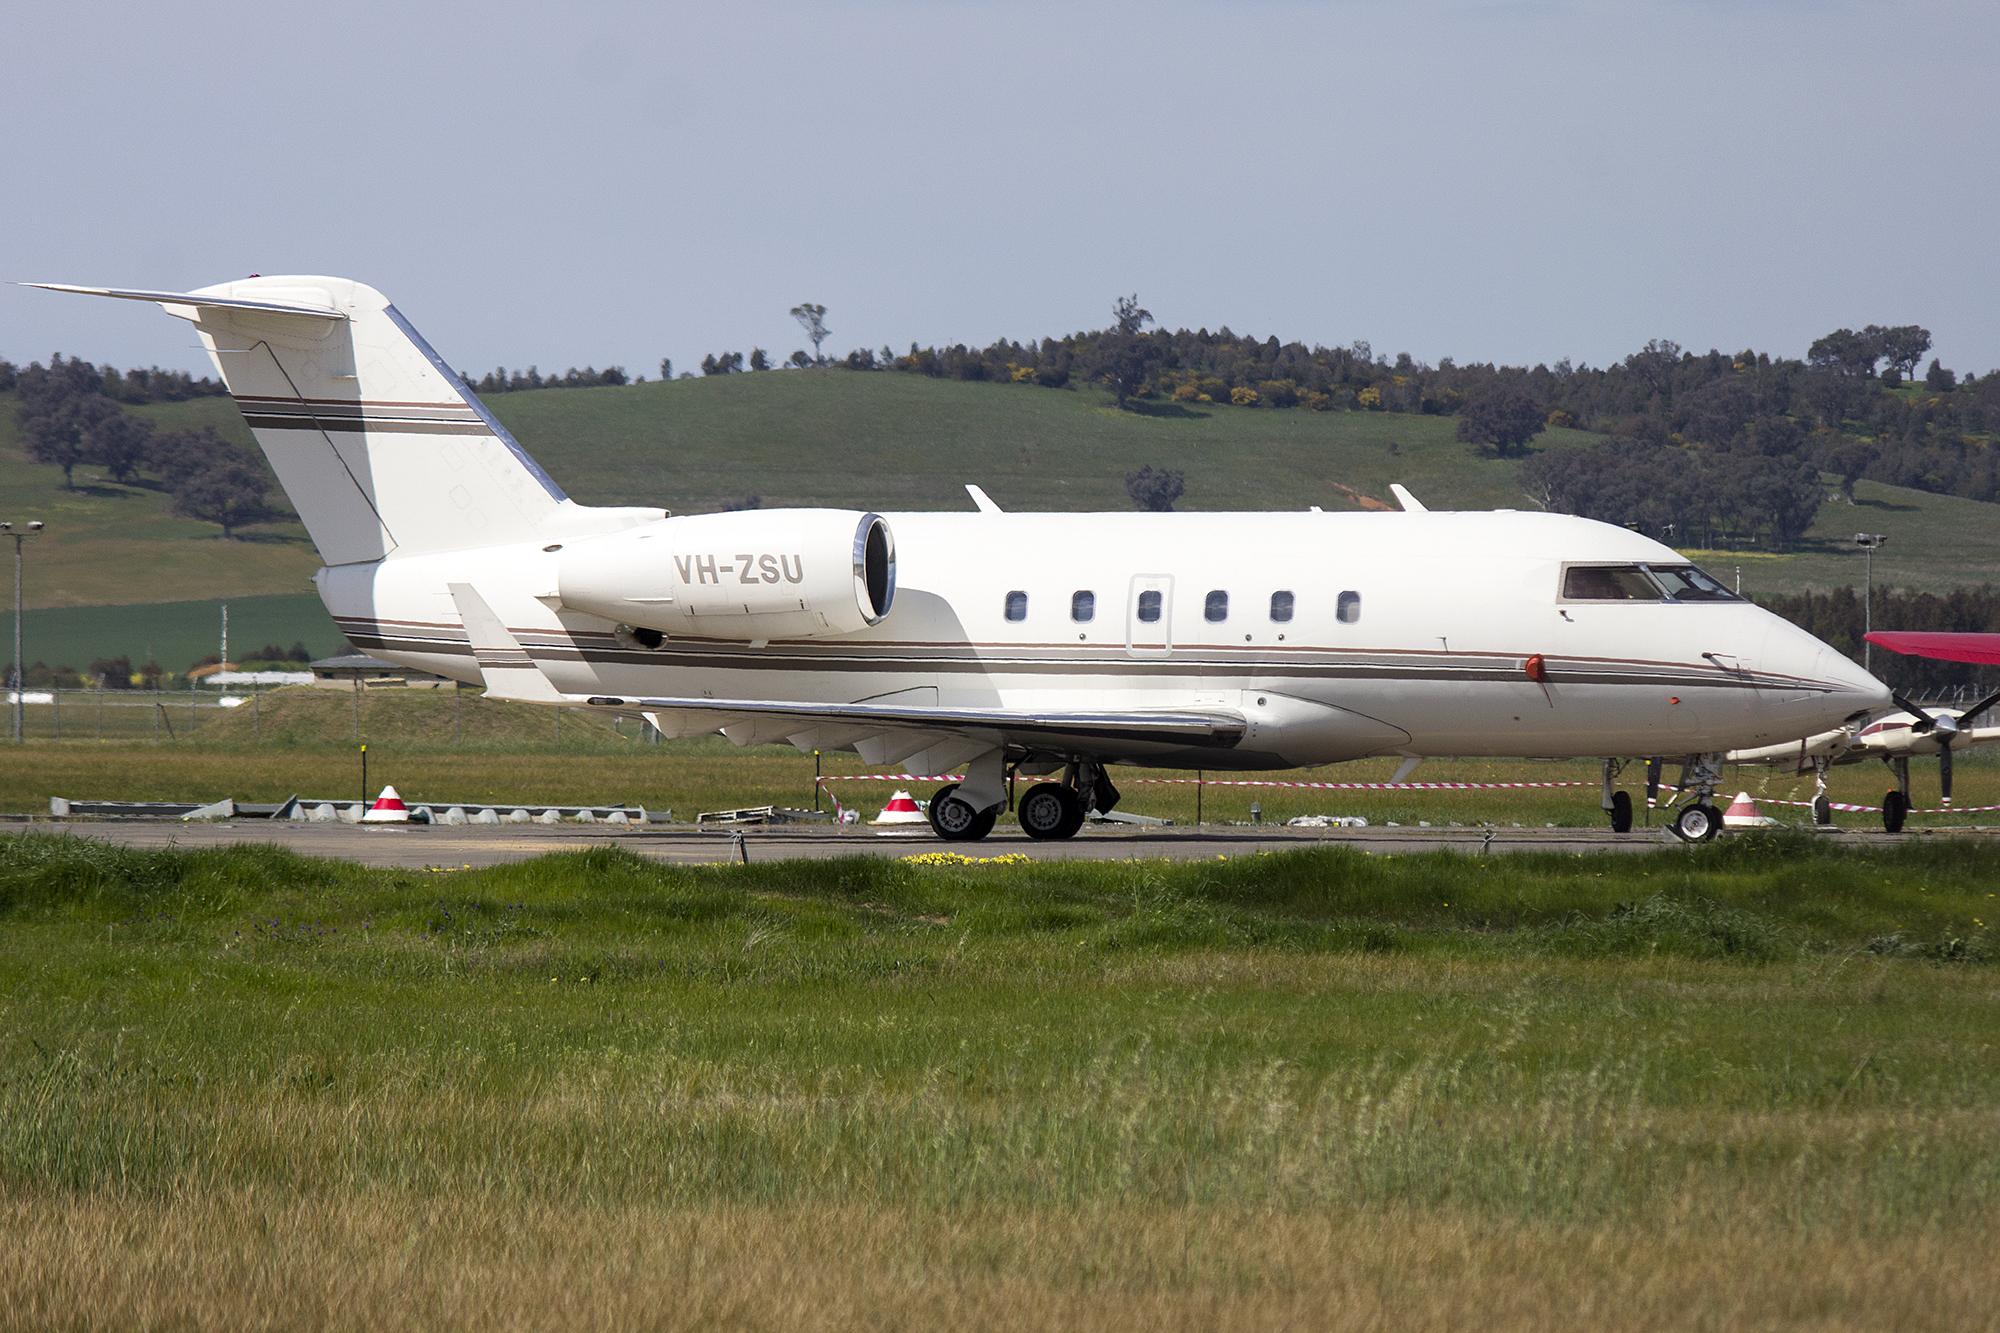 File:Revesco Aviation (VH-ZSU) Canadair CL-600-1A11 Challenger